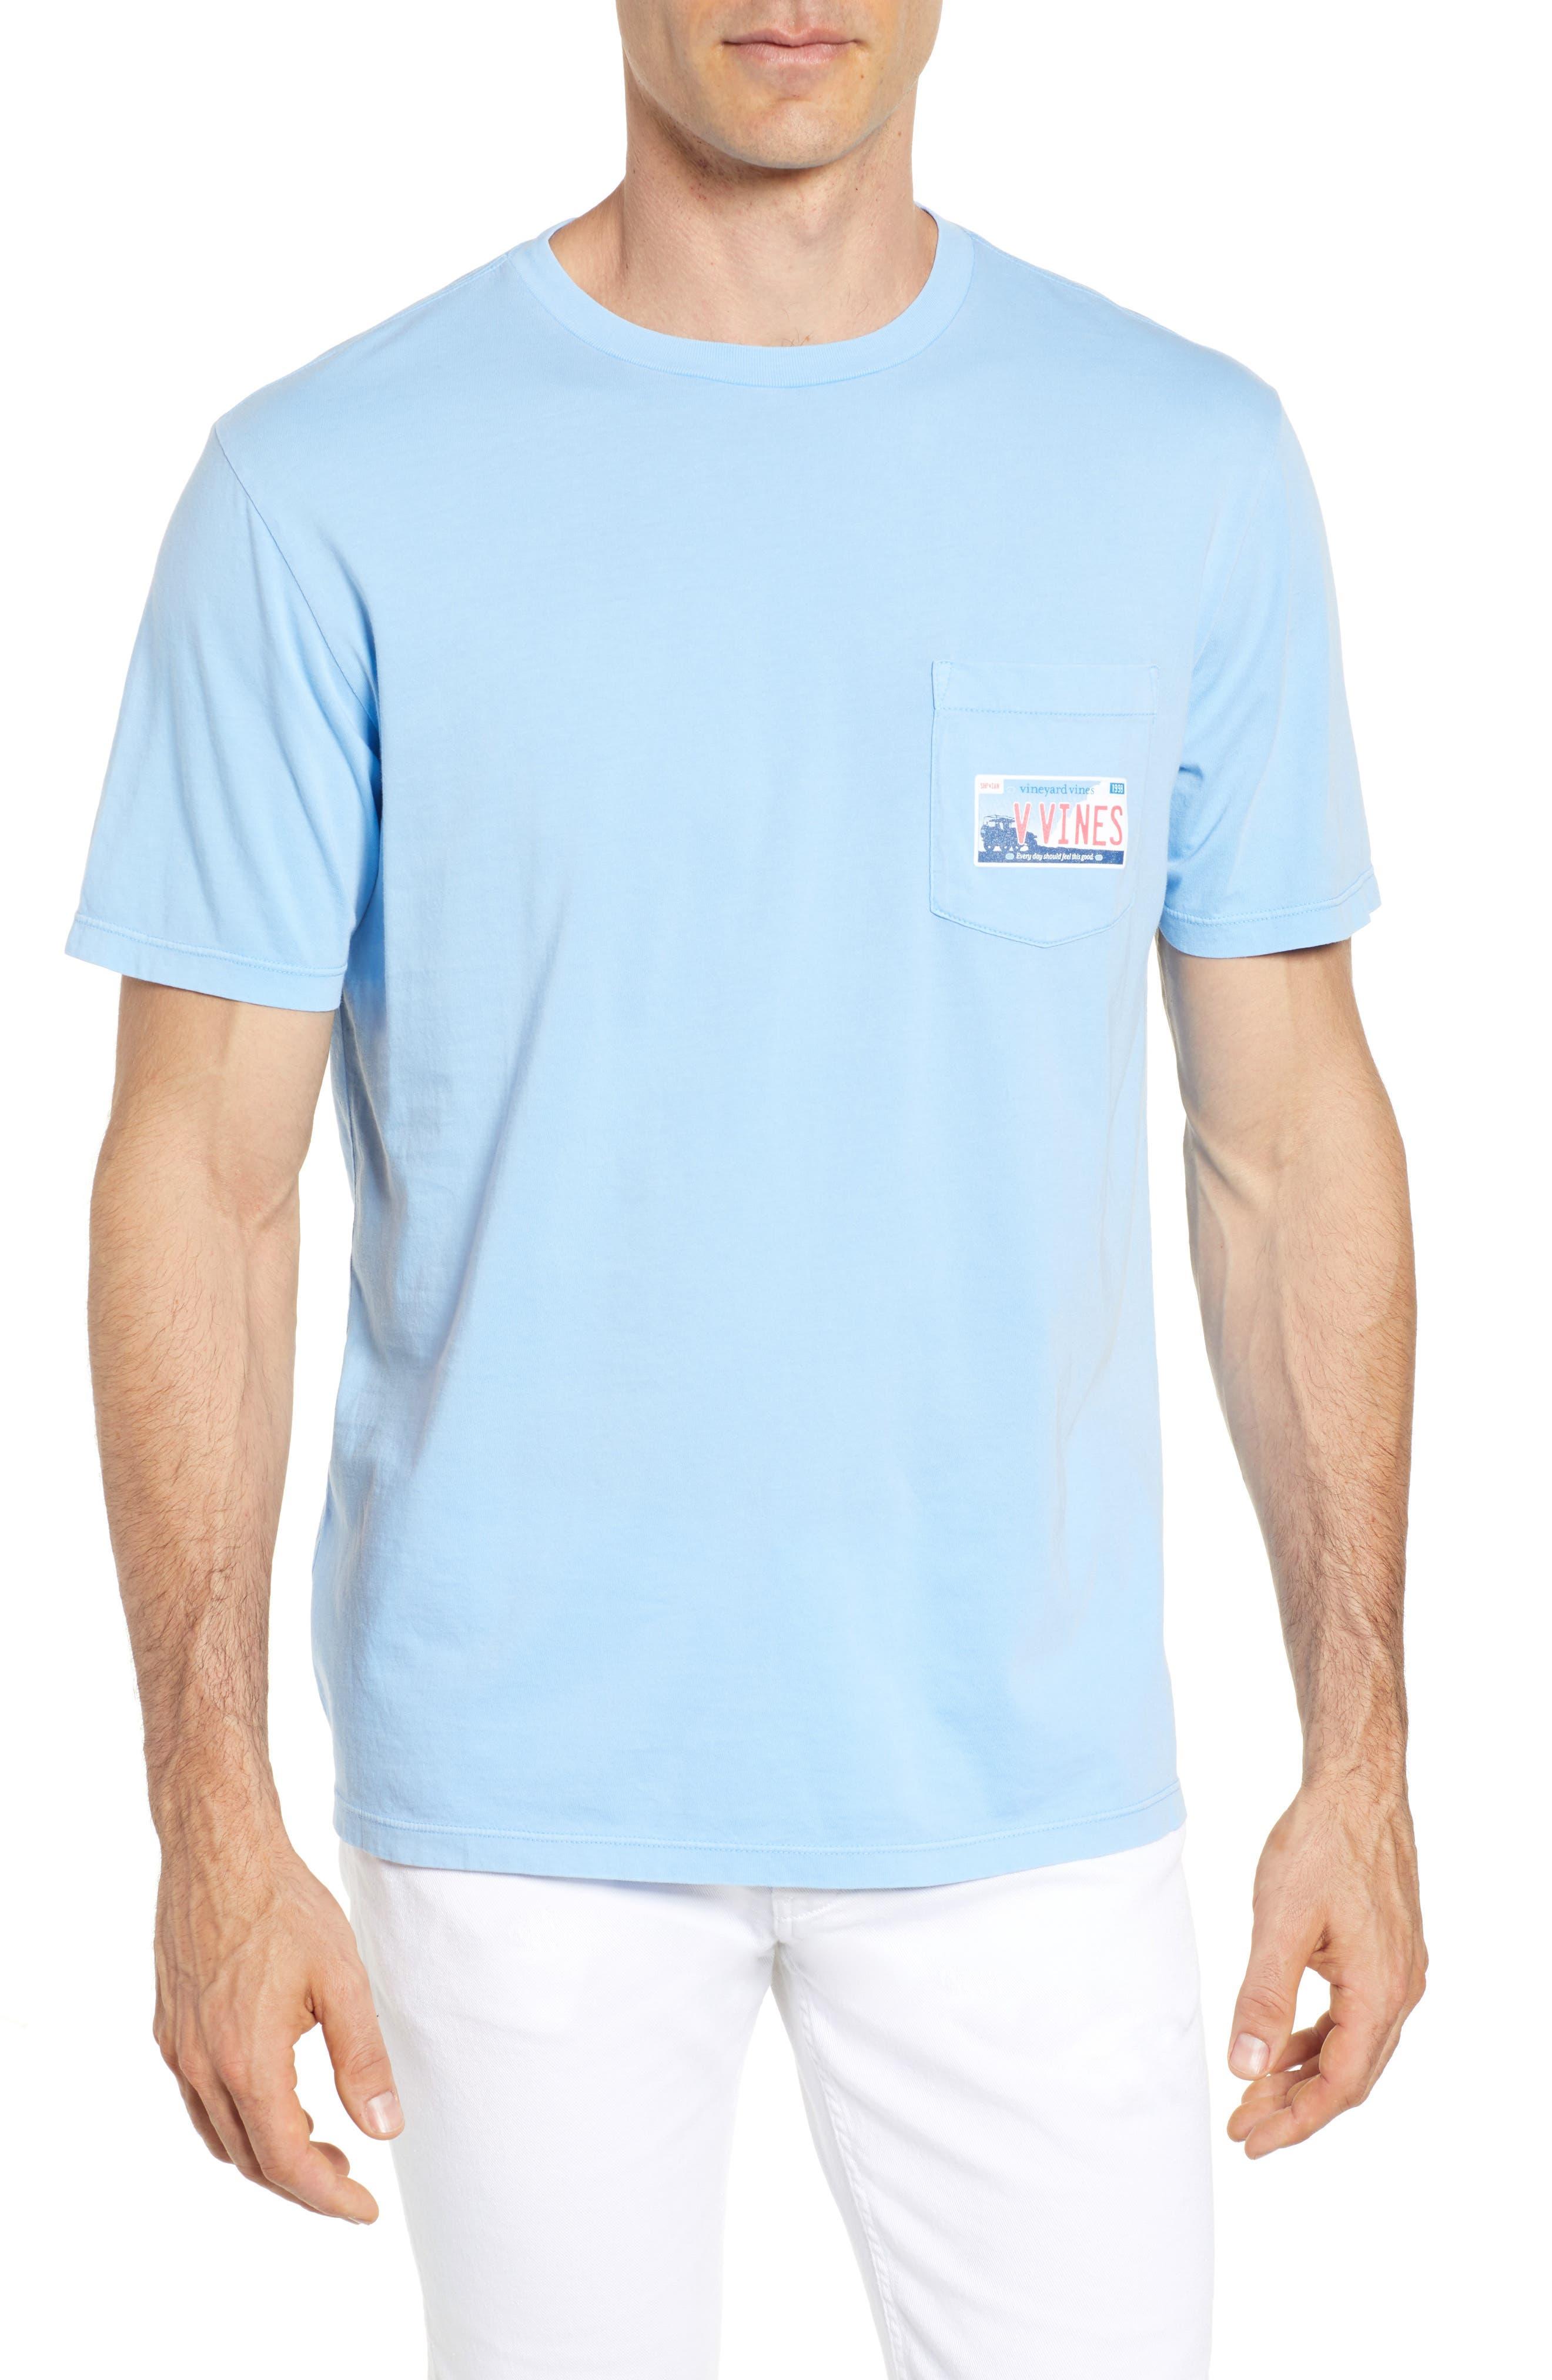 Tie Guys Plate Regular Fit Crewneck T-Shirt,                             Main thumbnail 1, color,                             Jake Blue